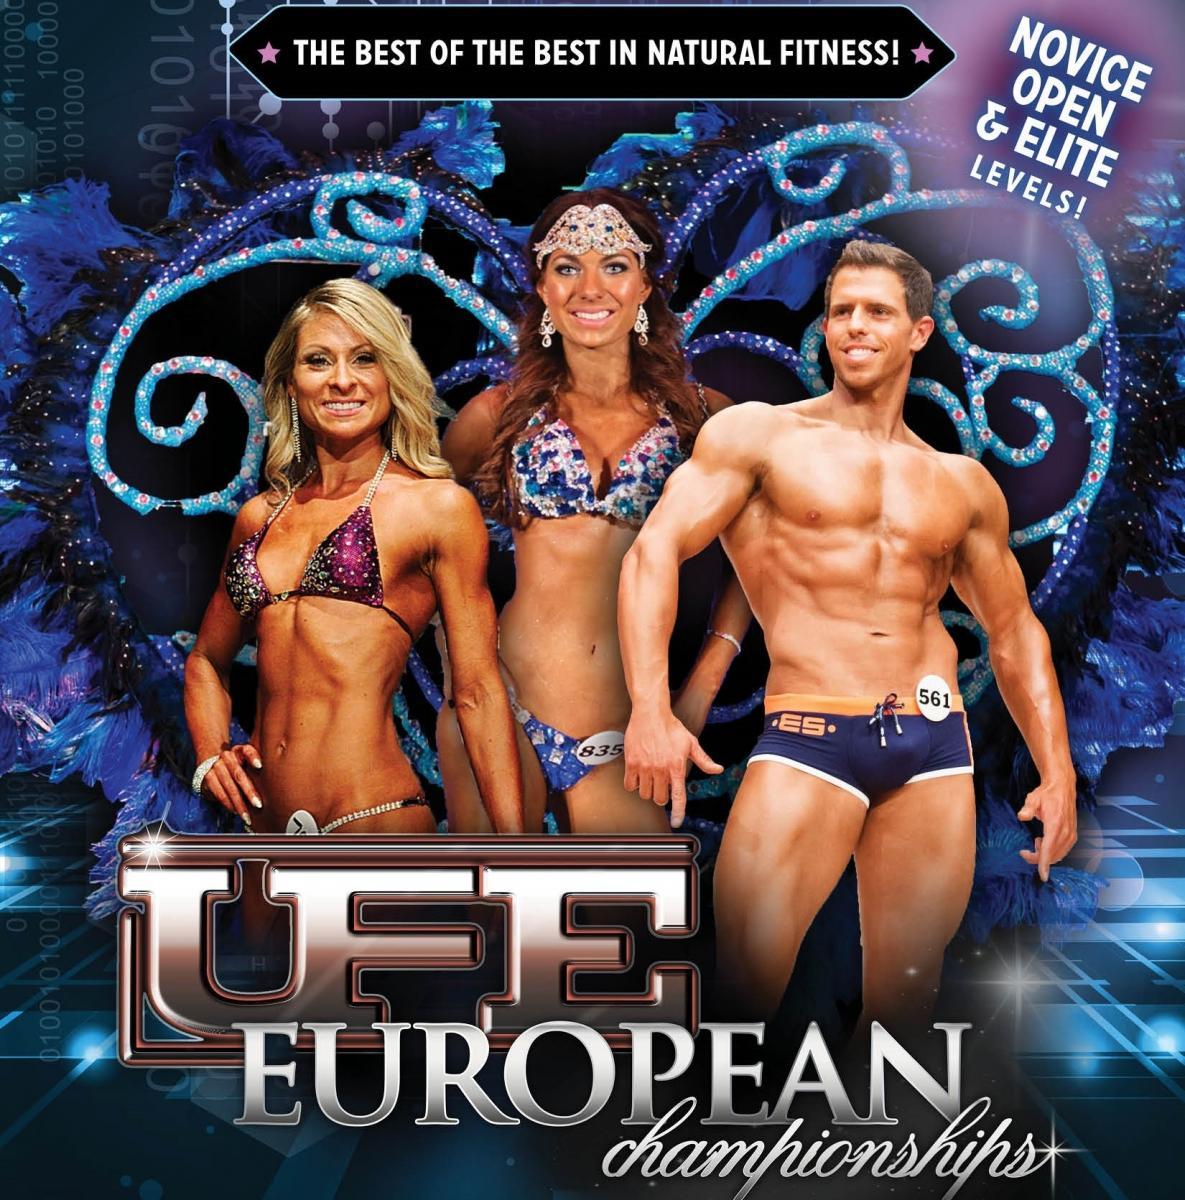 UFE European Championships